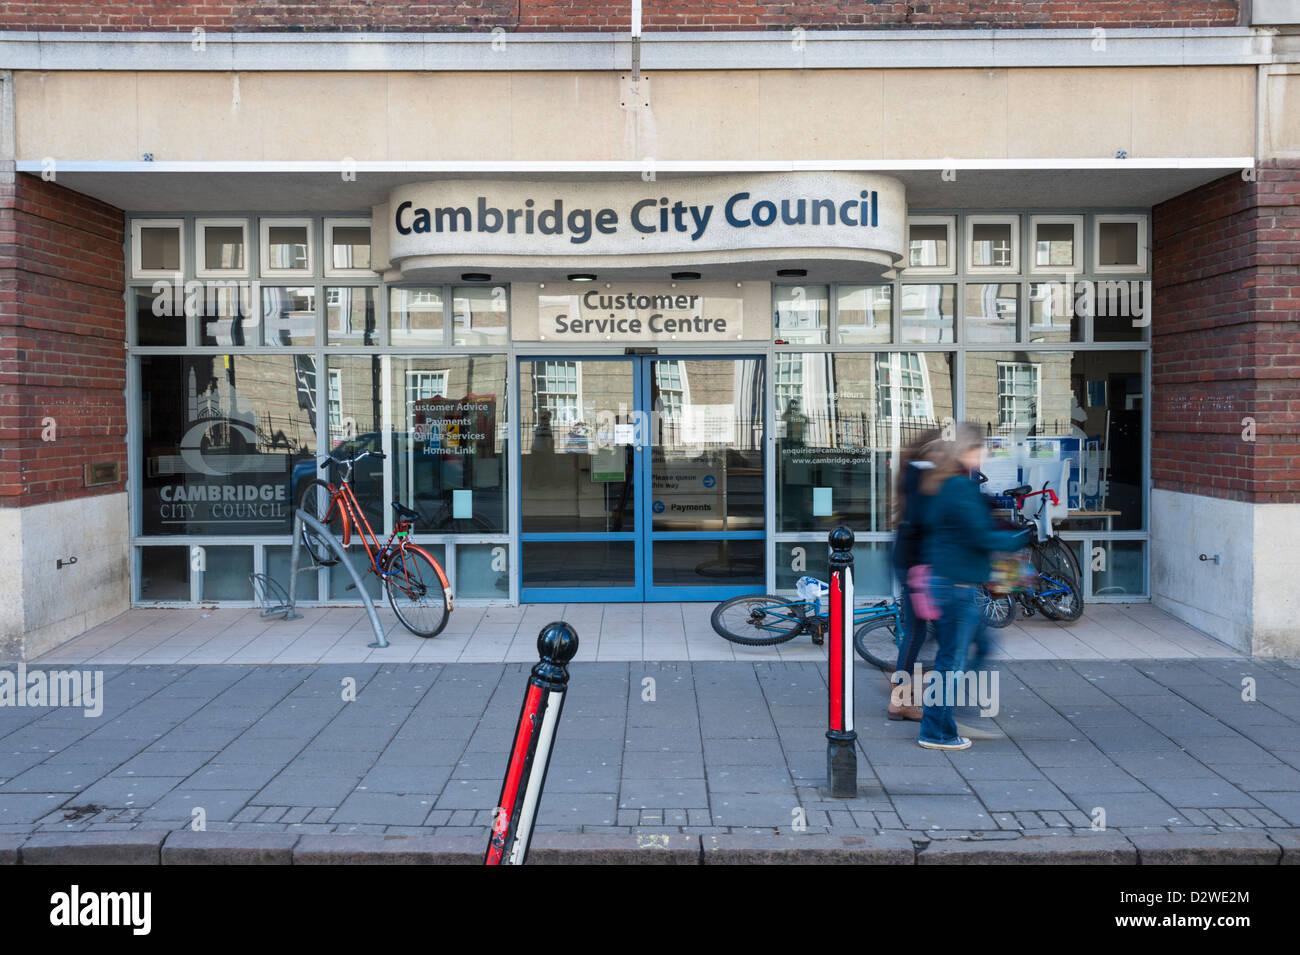 Cambridge City Council offices and Customer service centre Regent Street Cambridge UK Stock Photo